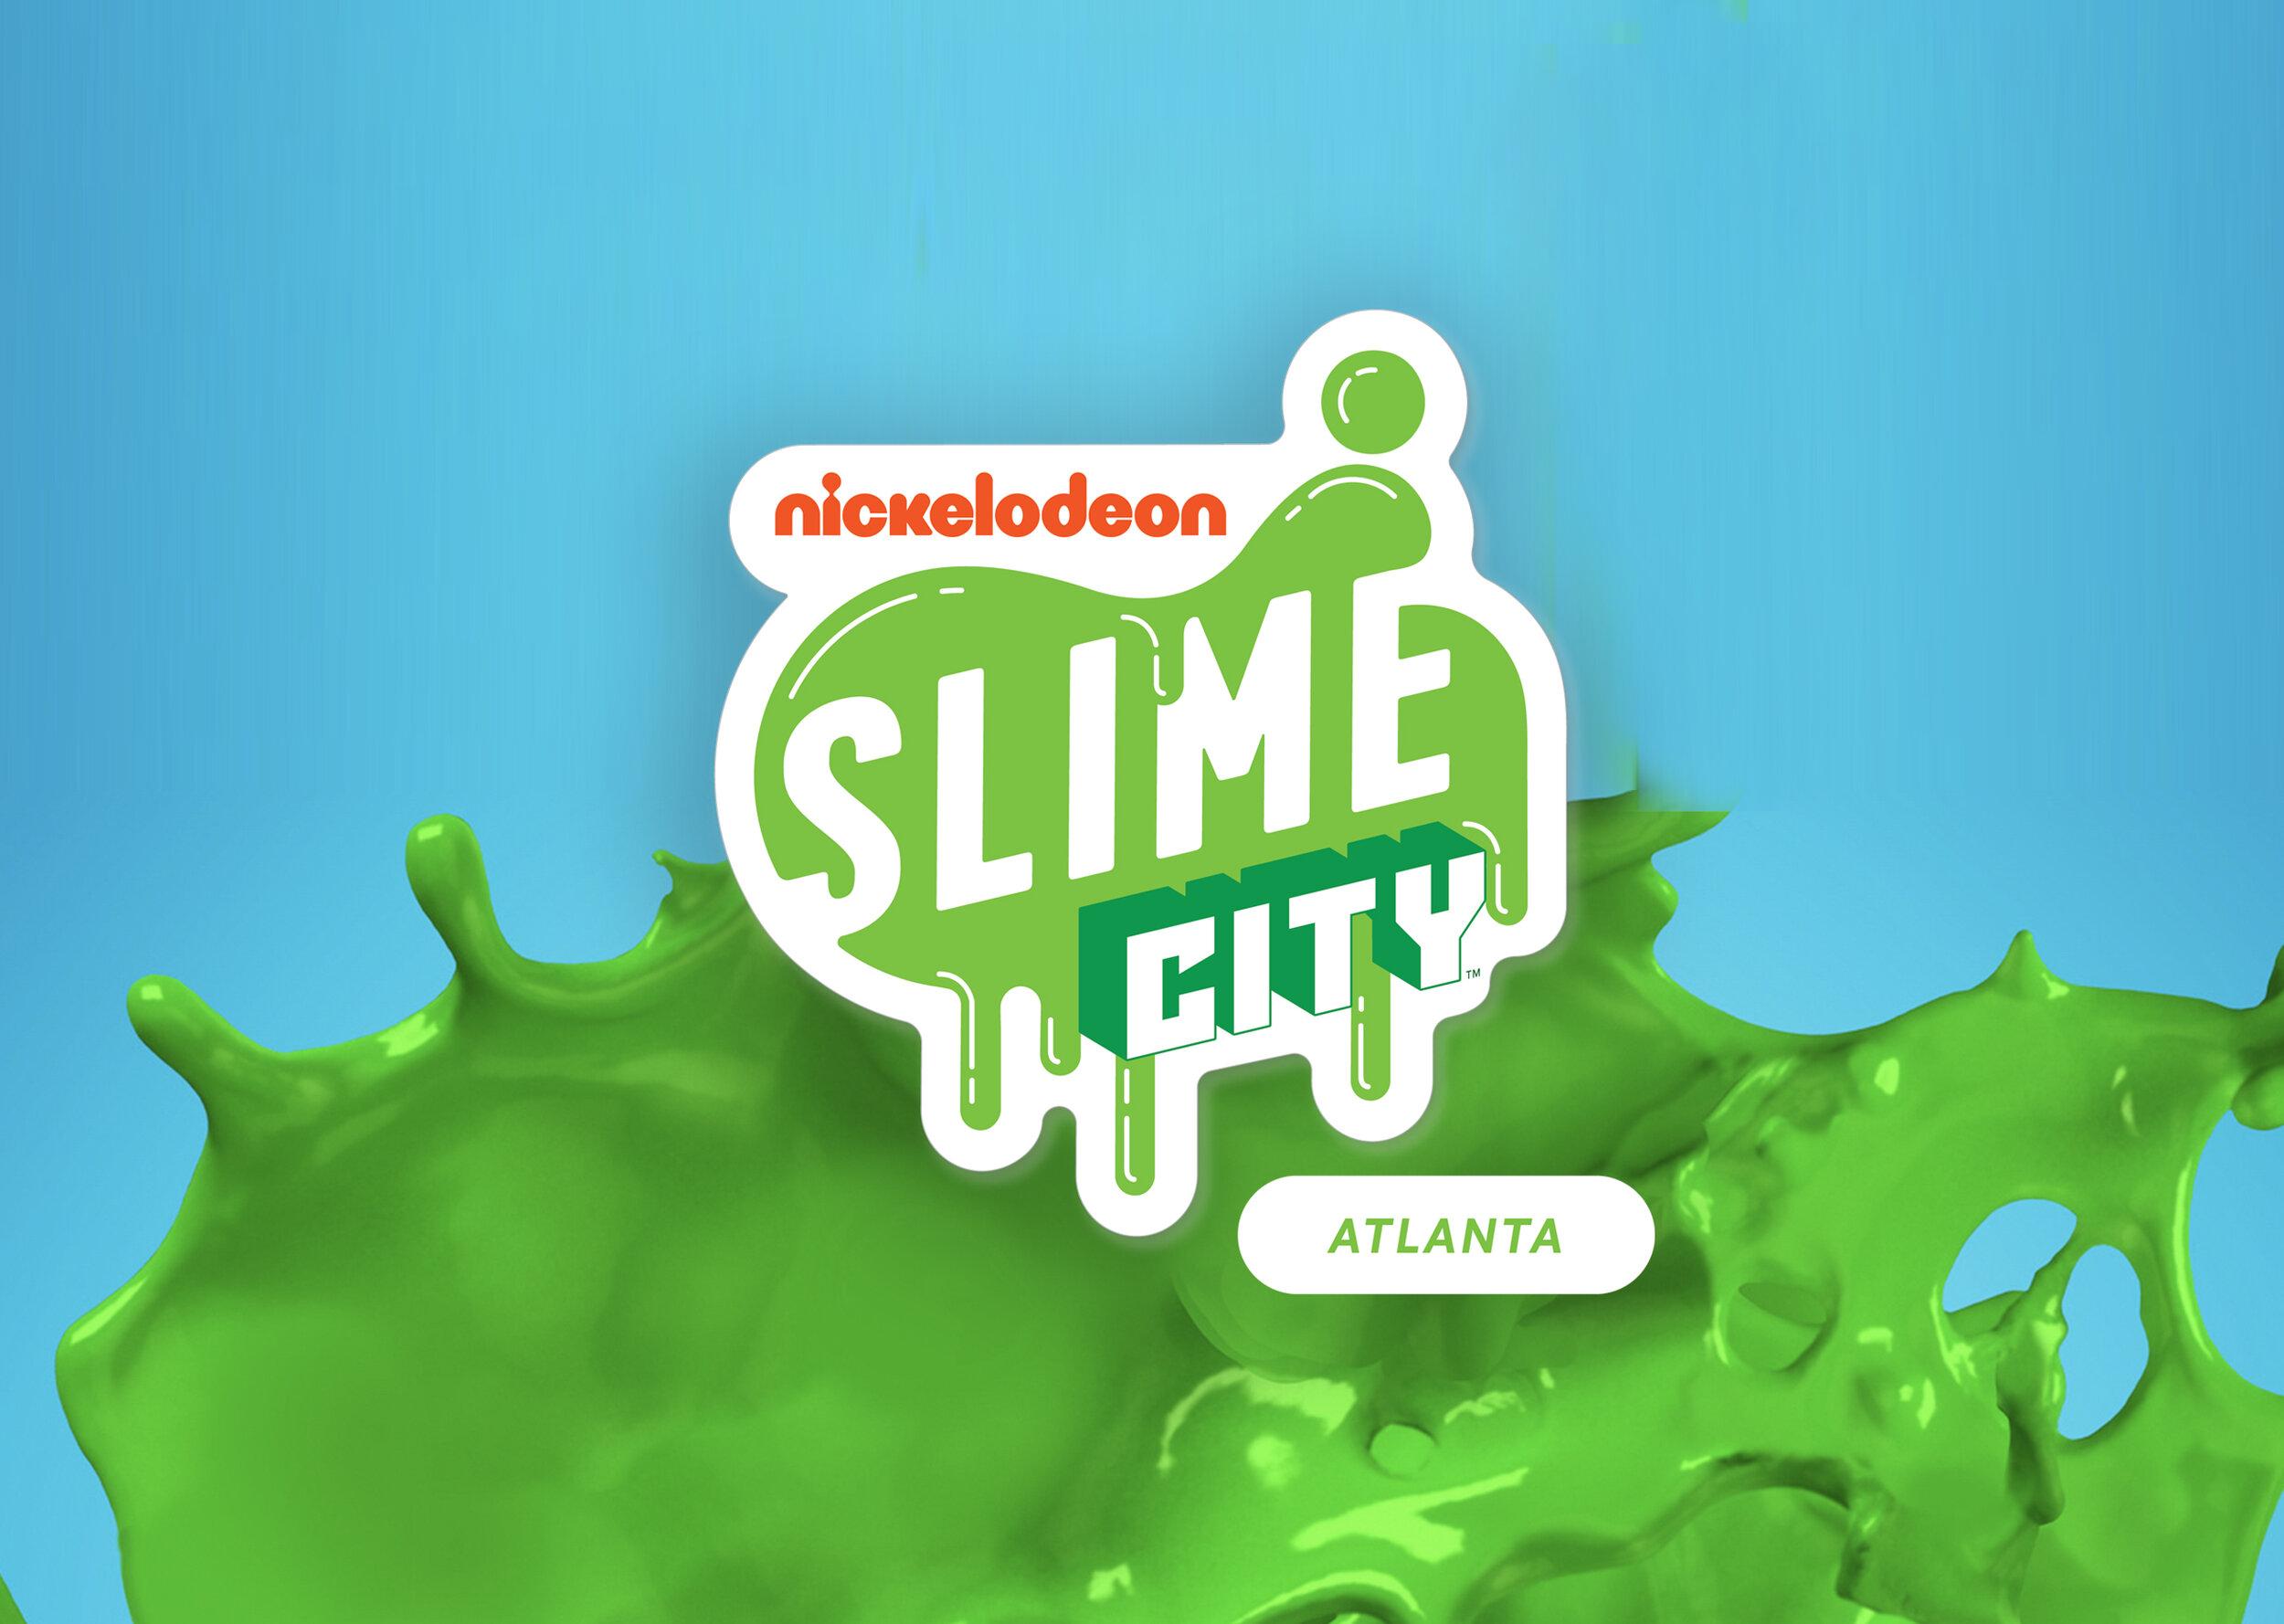 Nick-Slime-City-Cover.jpg